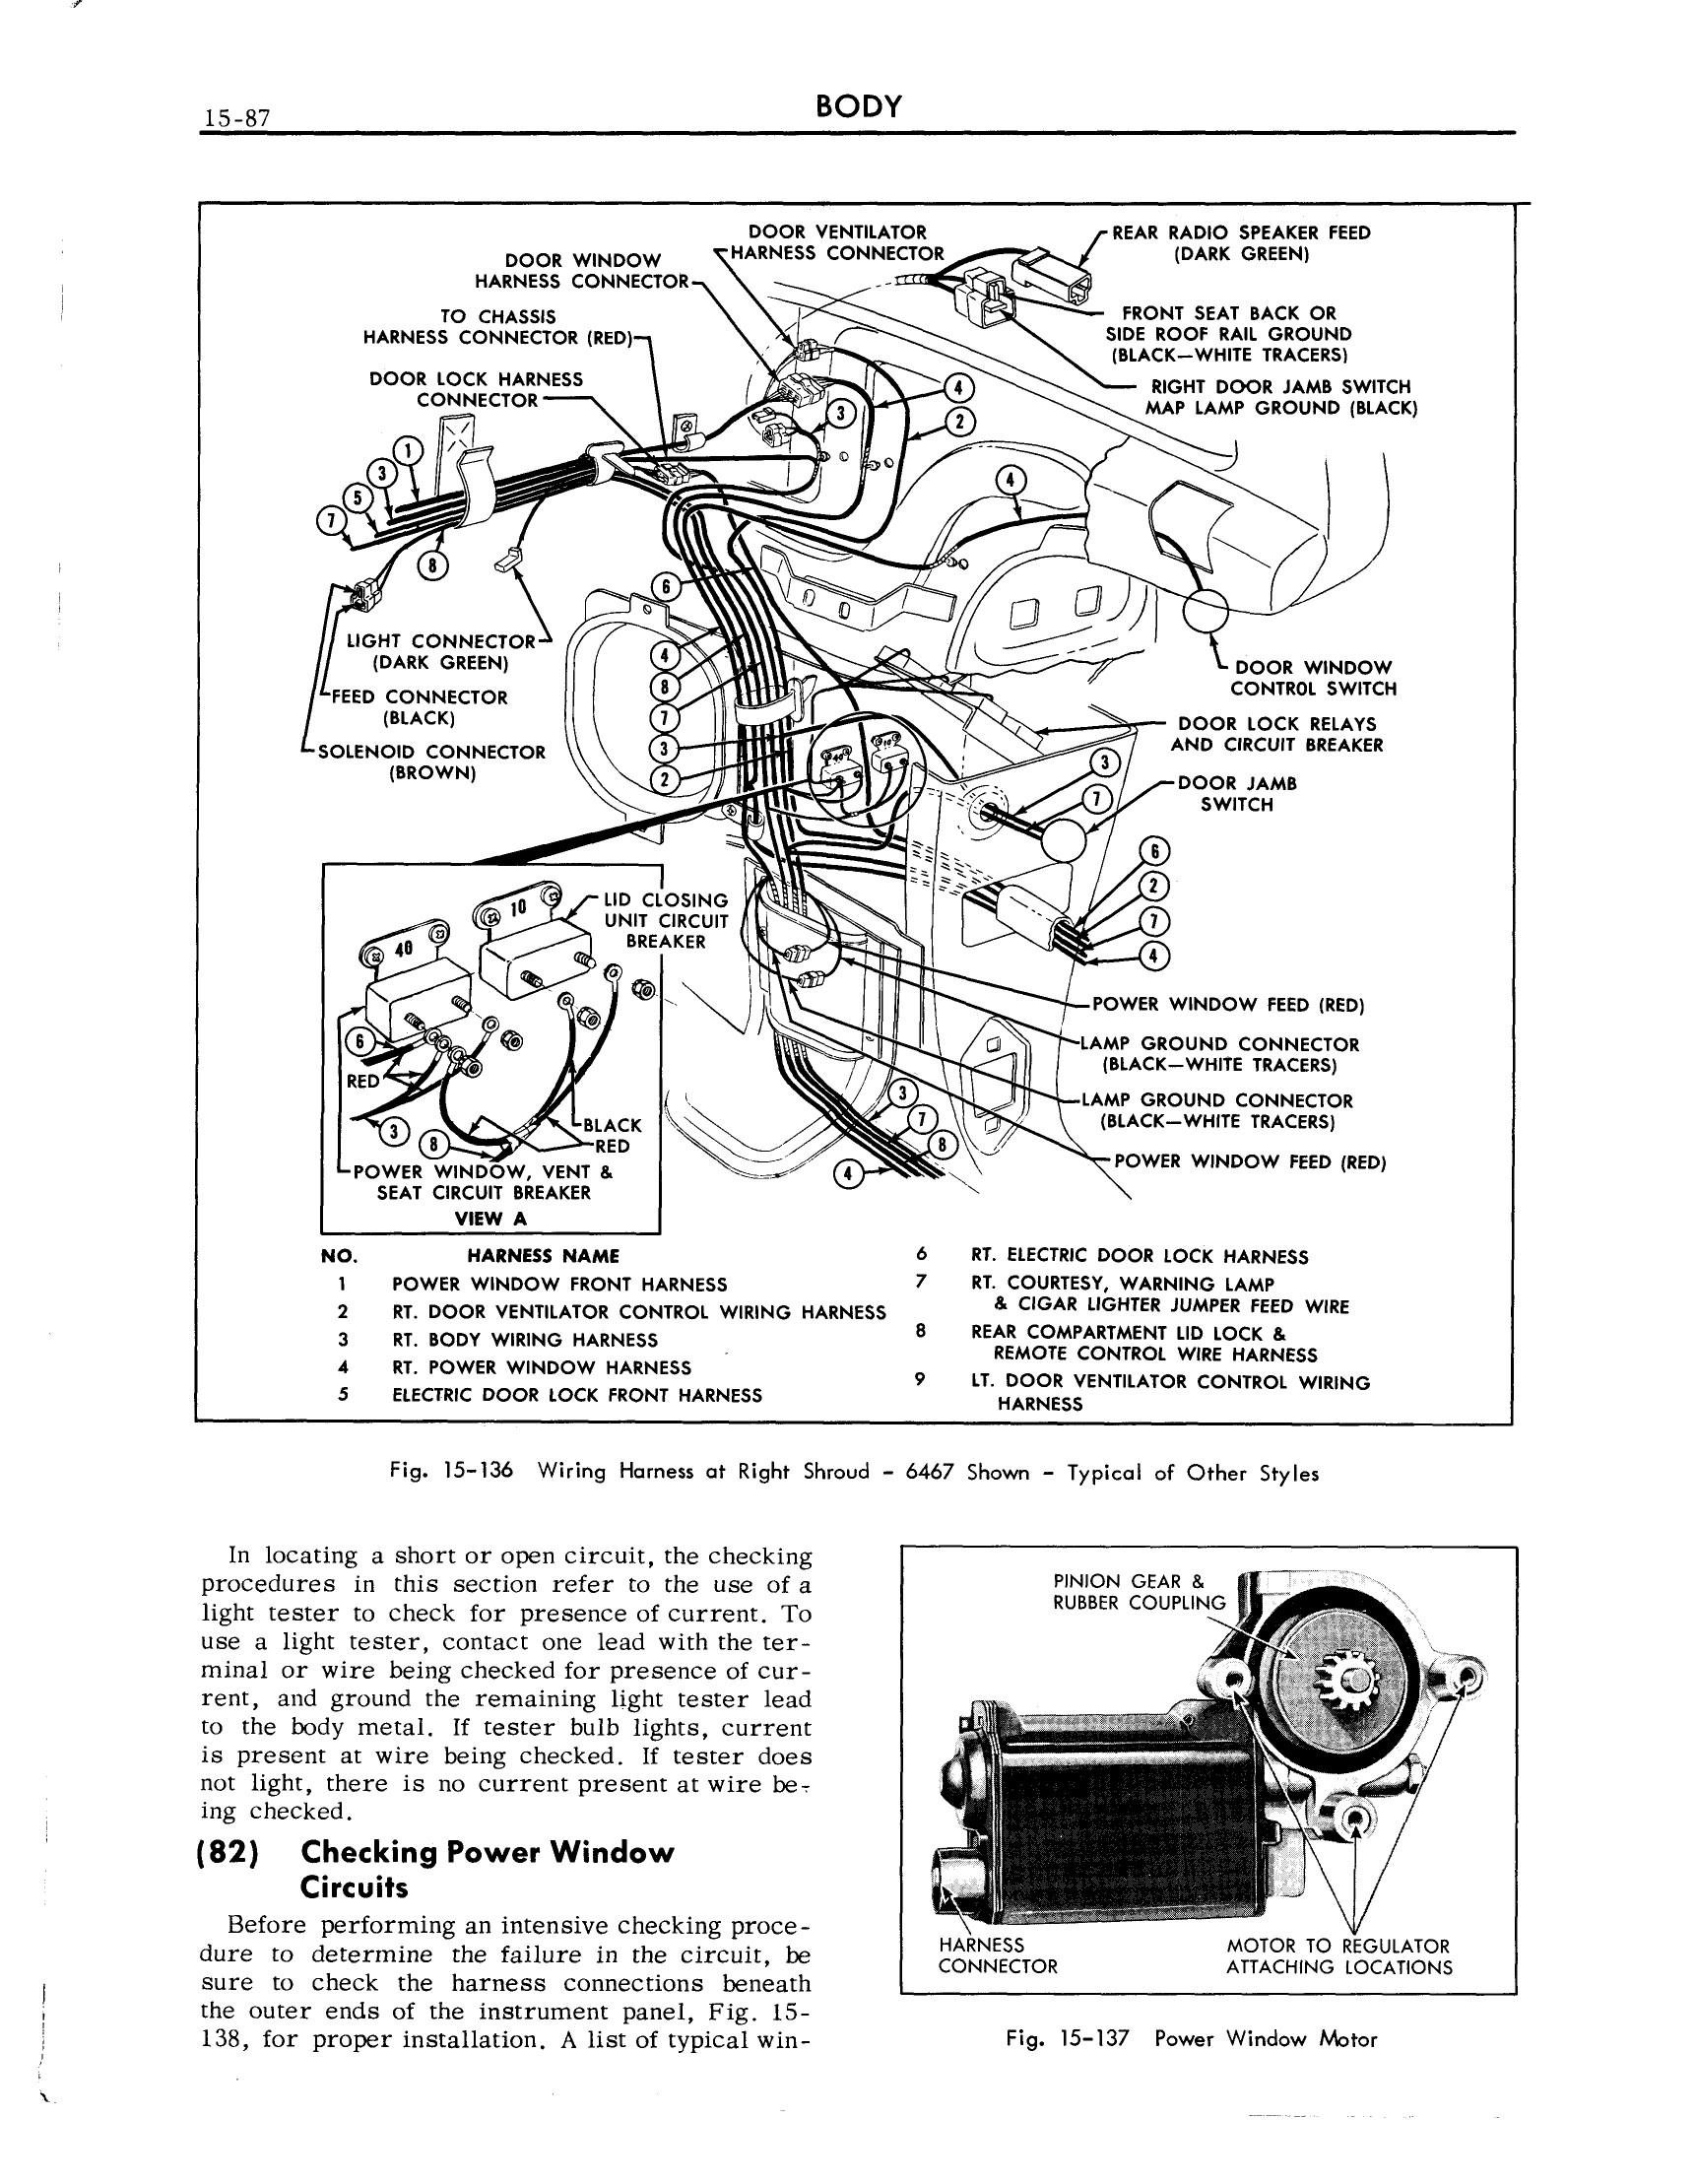 1959 Cadillac Shop Manual- Body Page 87 of 99